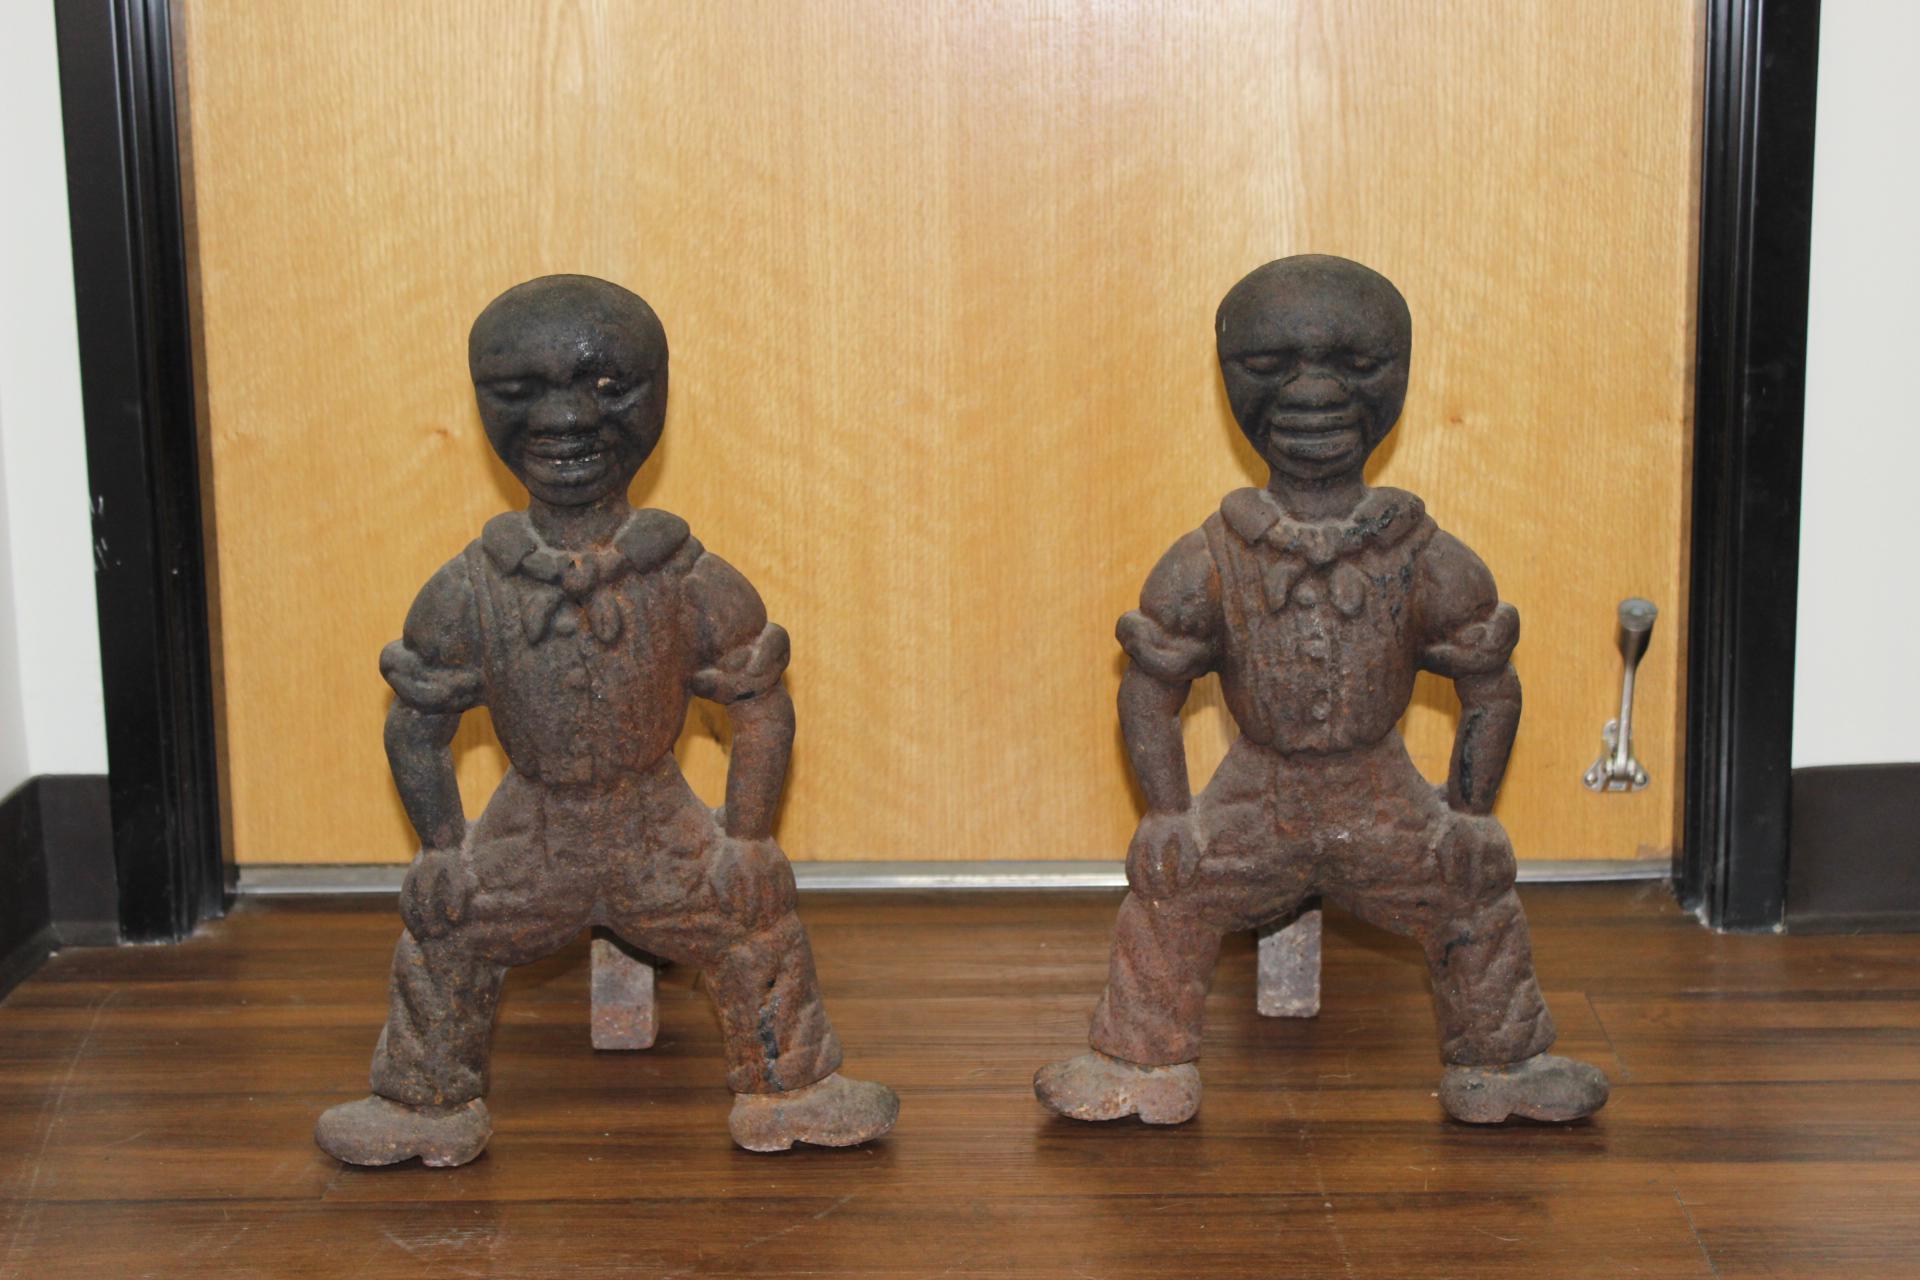 19th century antique black americana cast iron fireplace andirons rh chairish com Old Andirons Andirons Africa